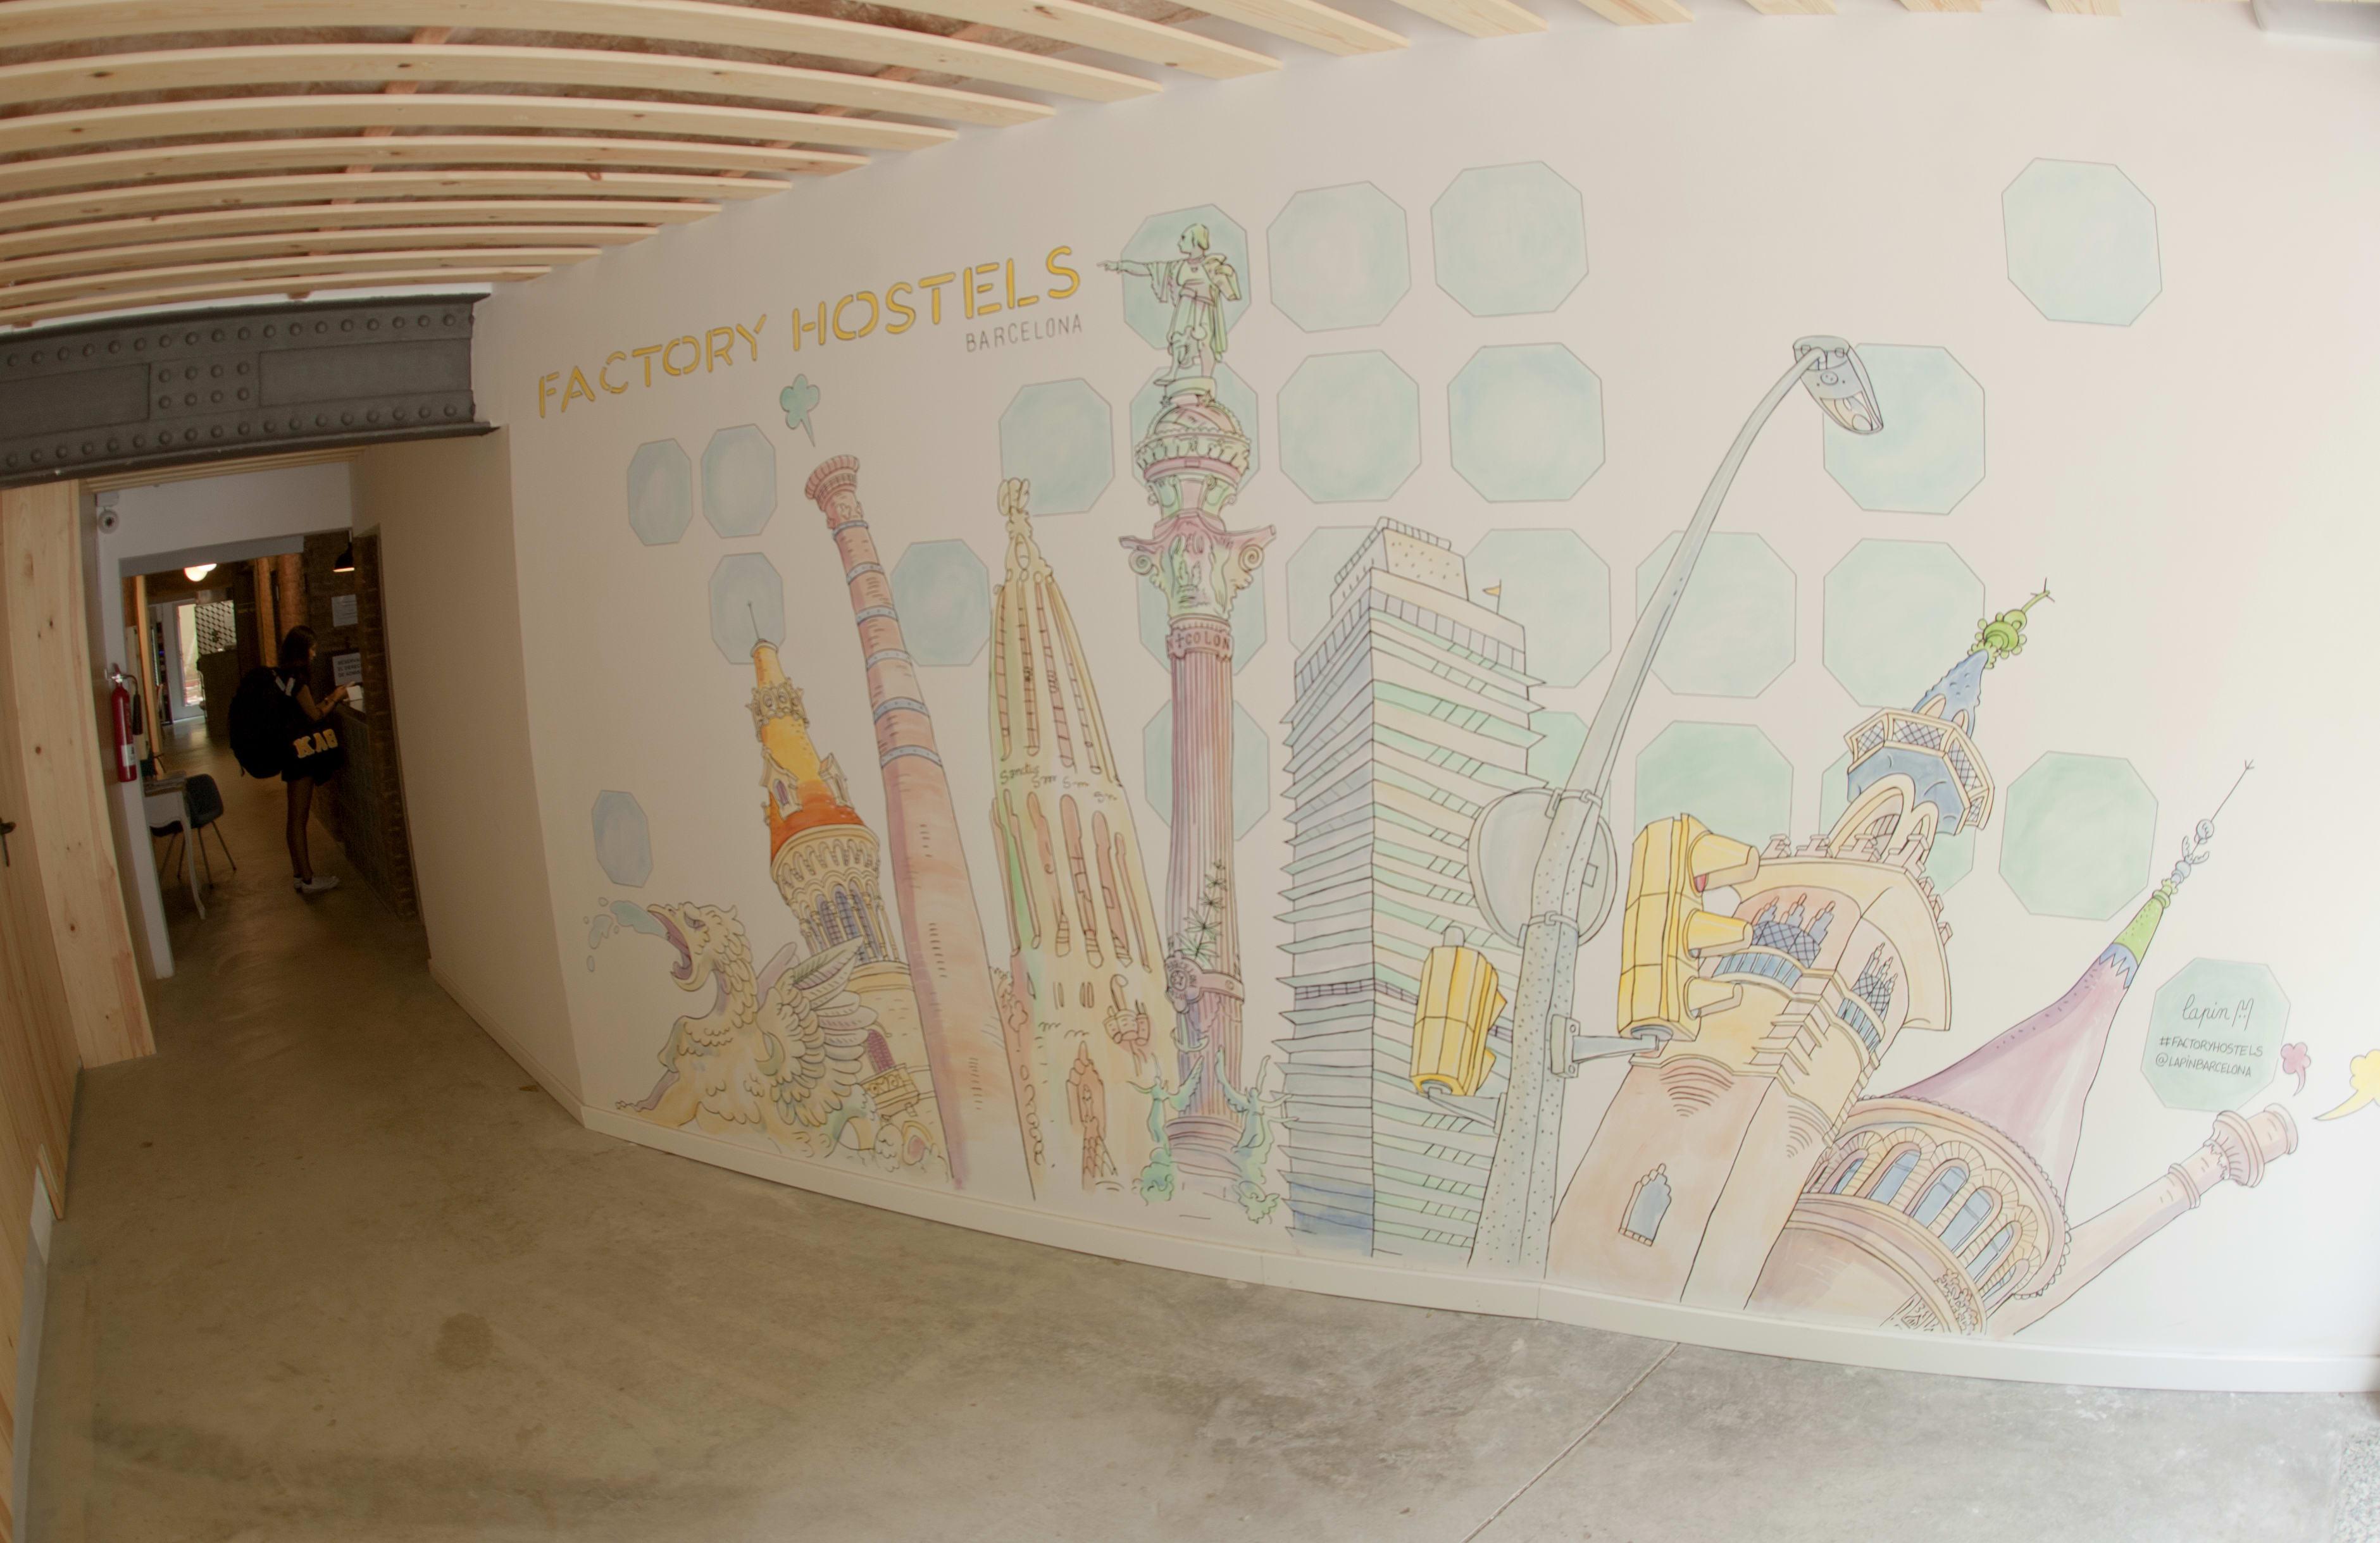 HOSTEL - The Loft Hostel